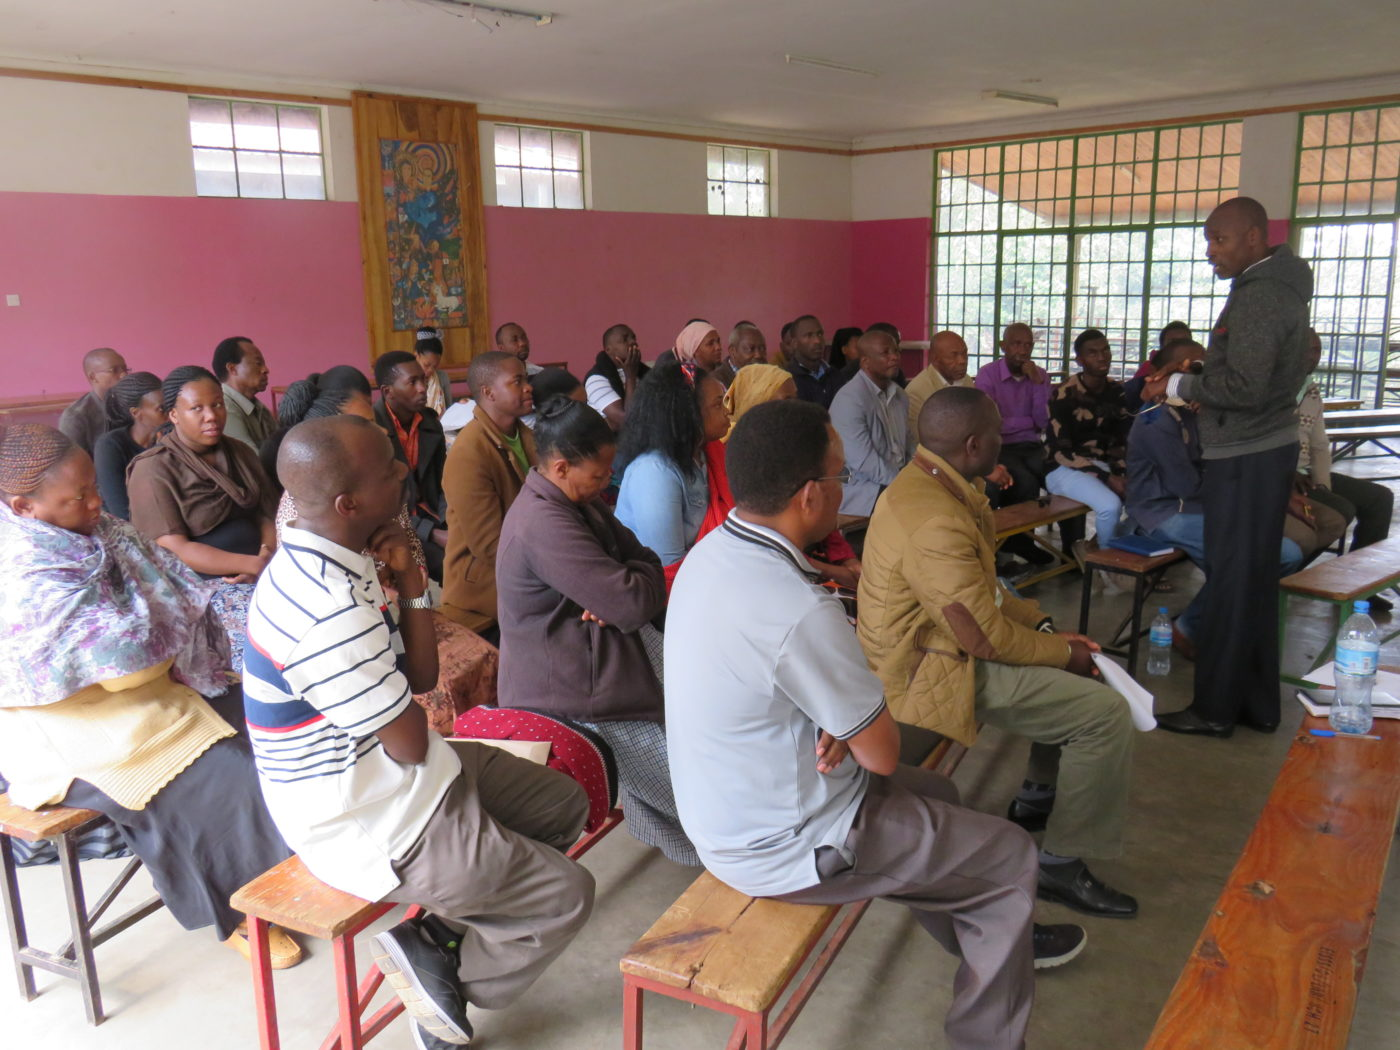 ERAN Arusha teachers training on positive discipline Q3 2019